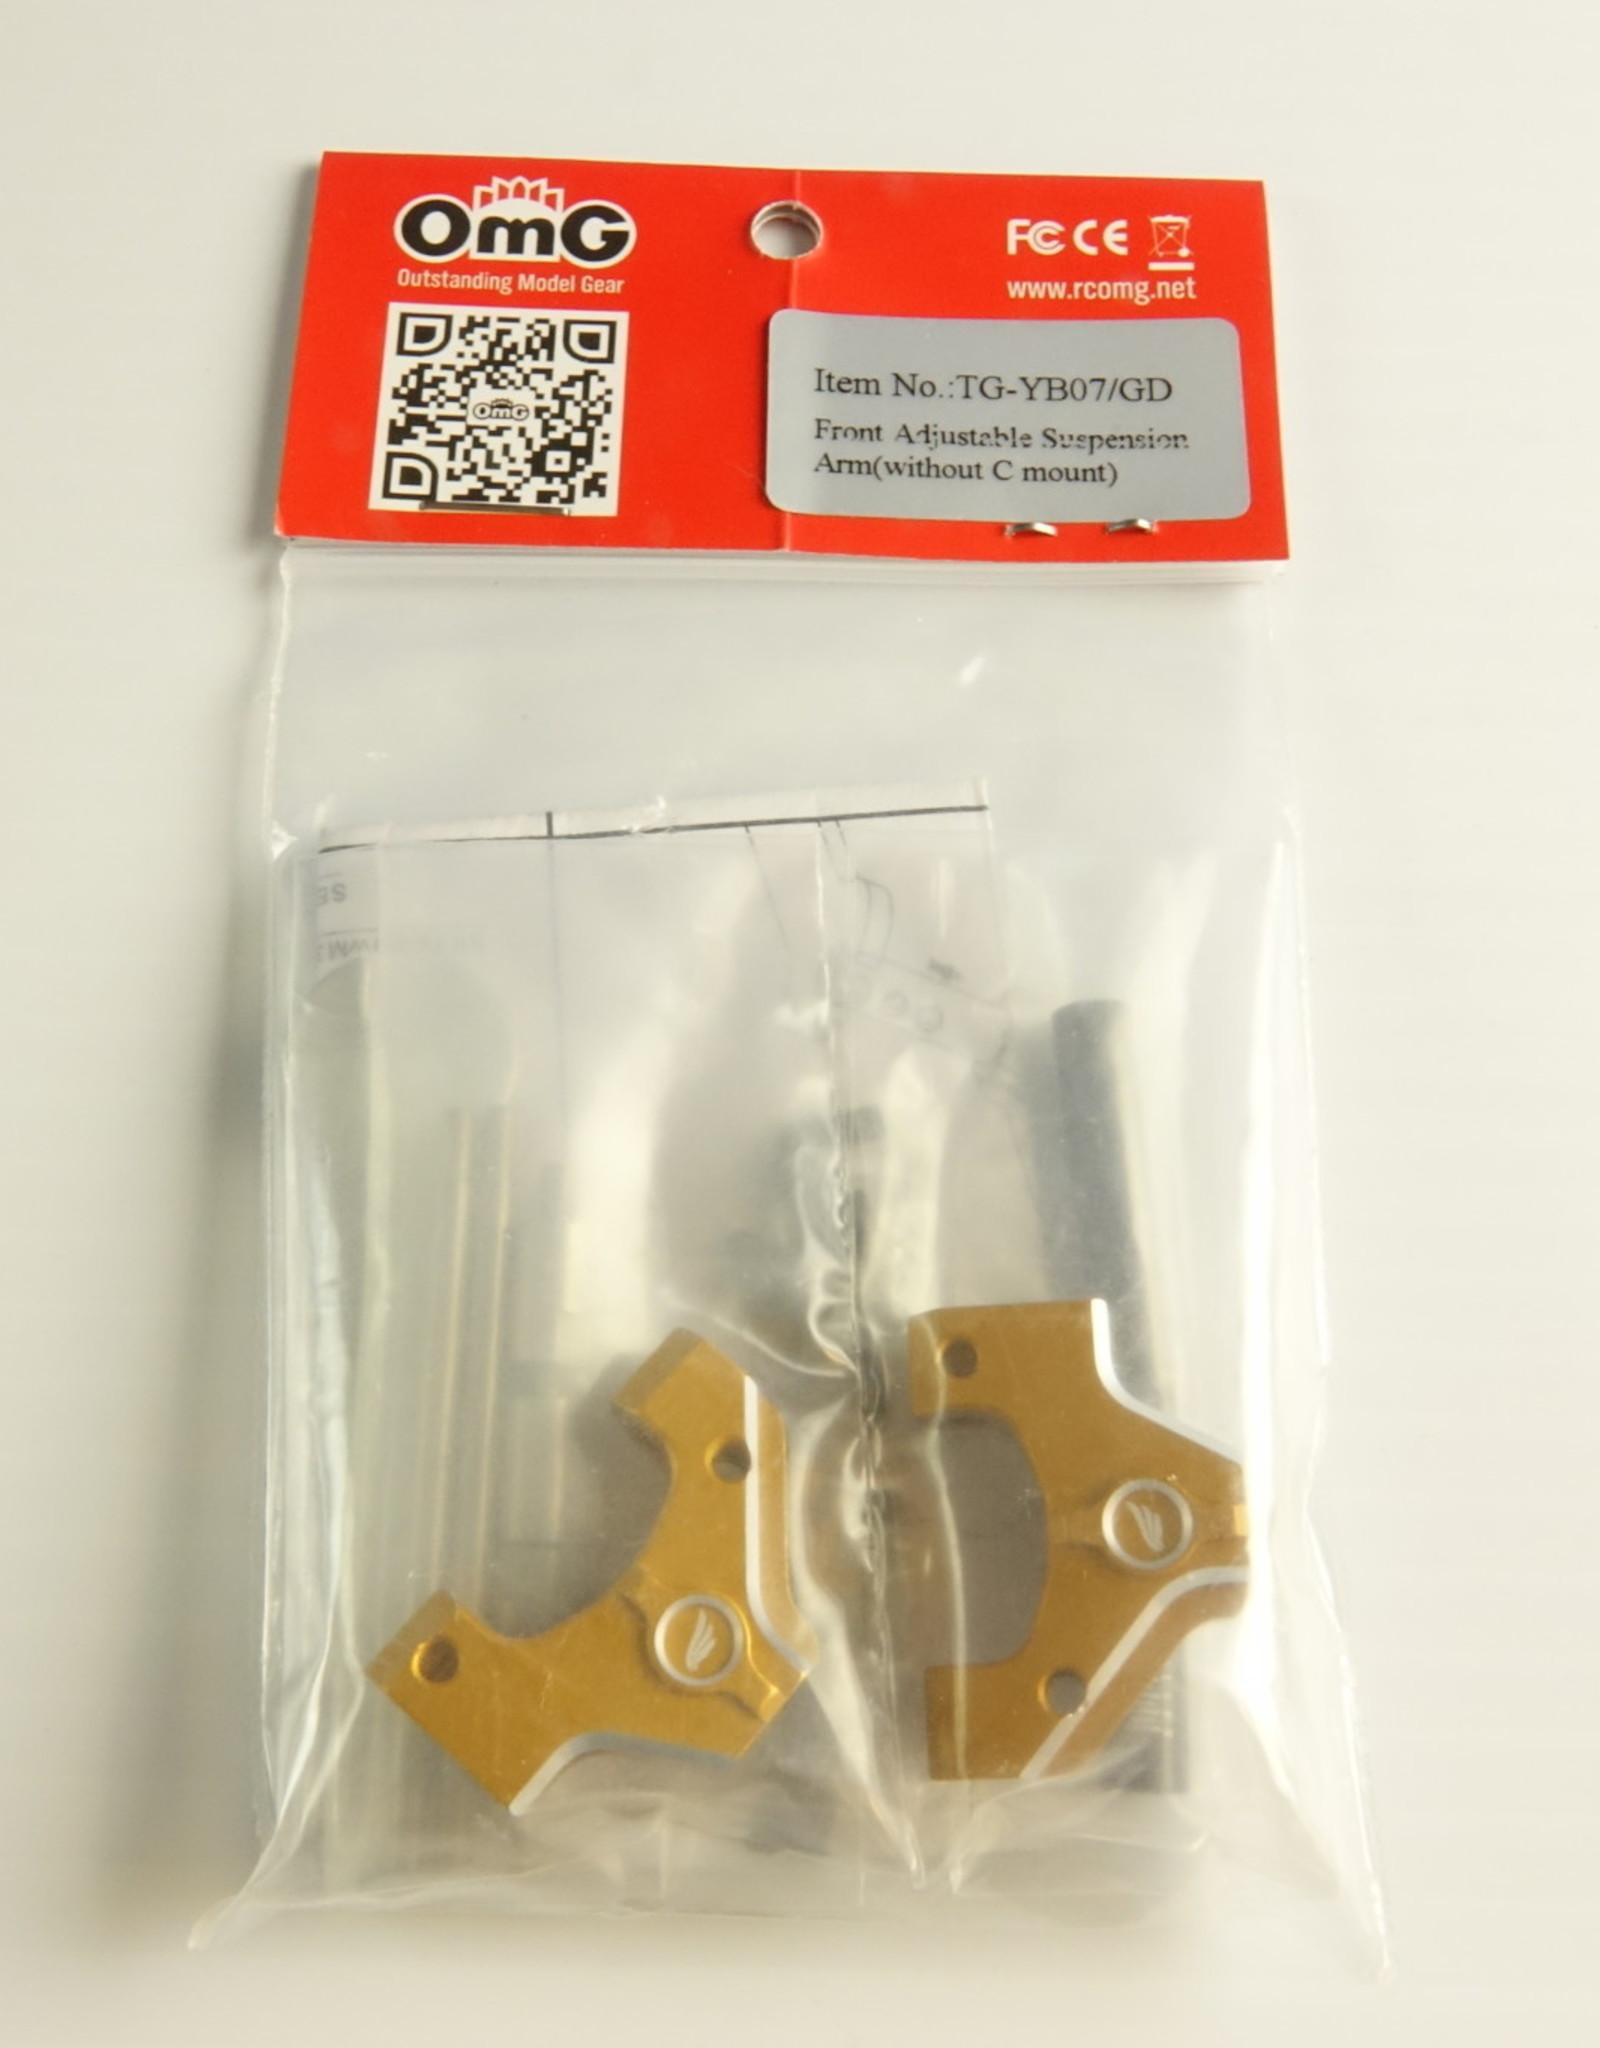 OmG OMGTG-YB07-GD Front Adjustable Suspension Arm (Gold) - RCOMG TG-YB07-GD